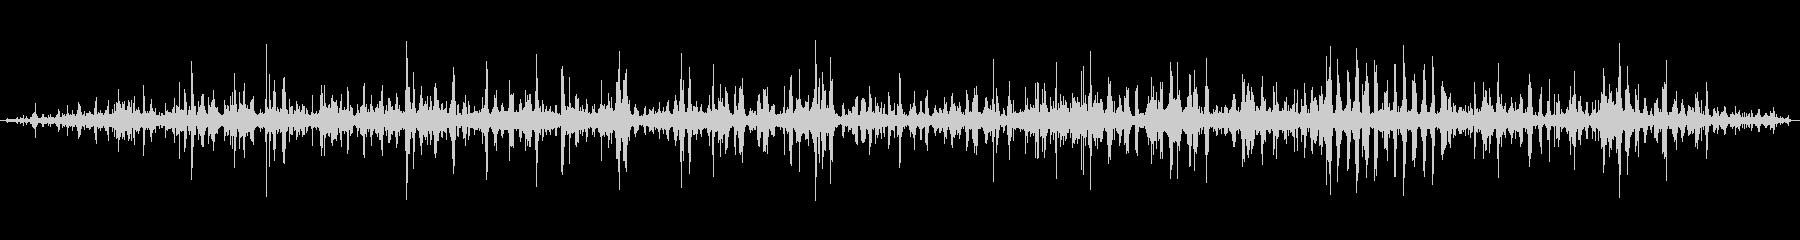 [ASMR]波打ち際の音_002の未再生の波形